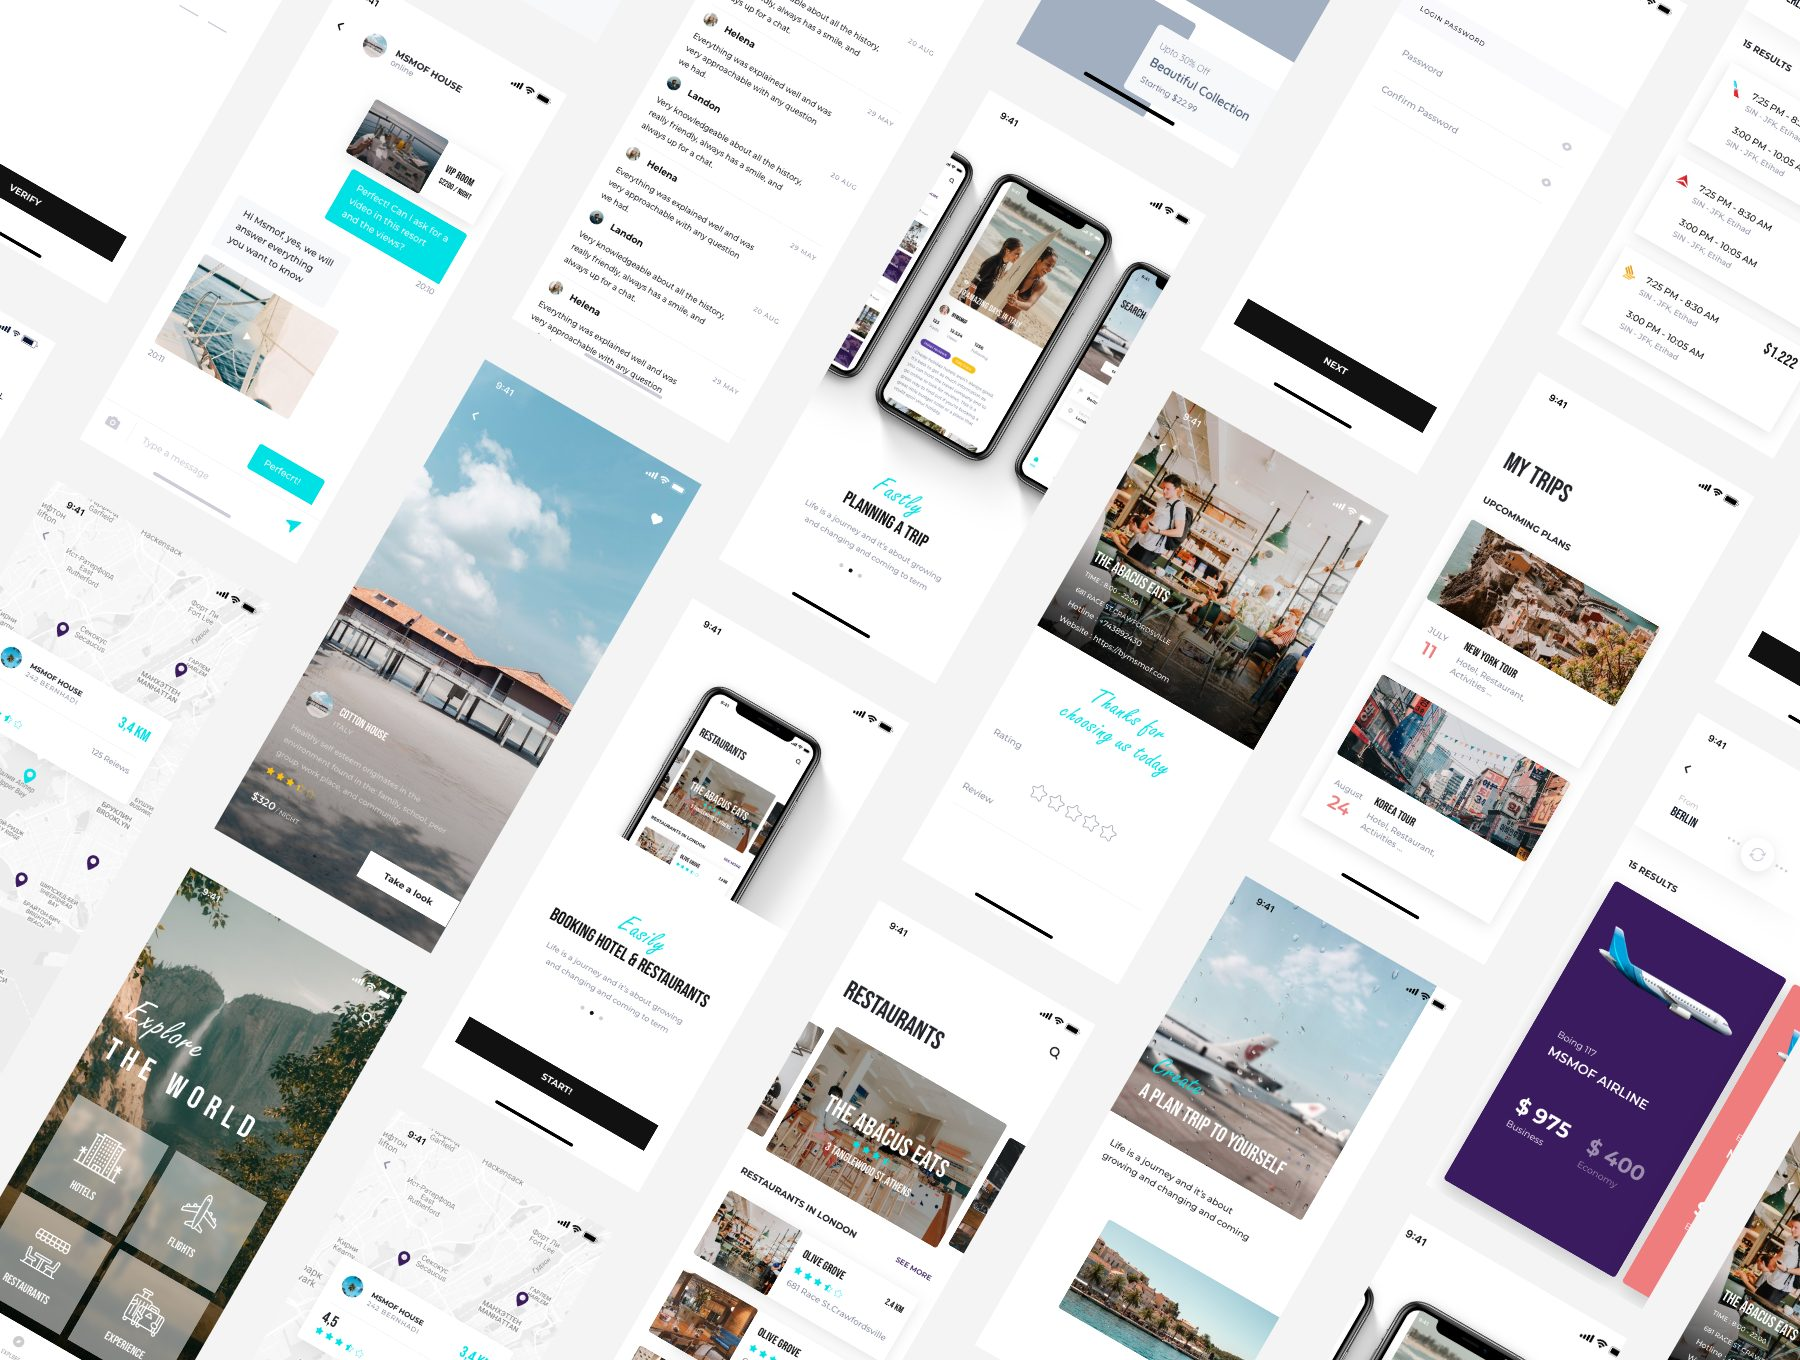 高端的旅行社交主题APP UI KIT套装 app设计 app界面设计 iOS Ui[Sketch,XD,fig] METHYST TRAVEL APP